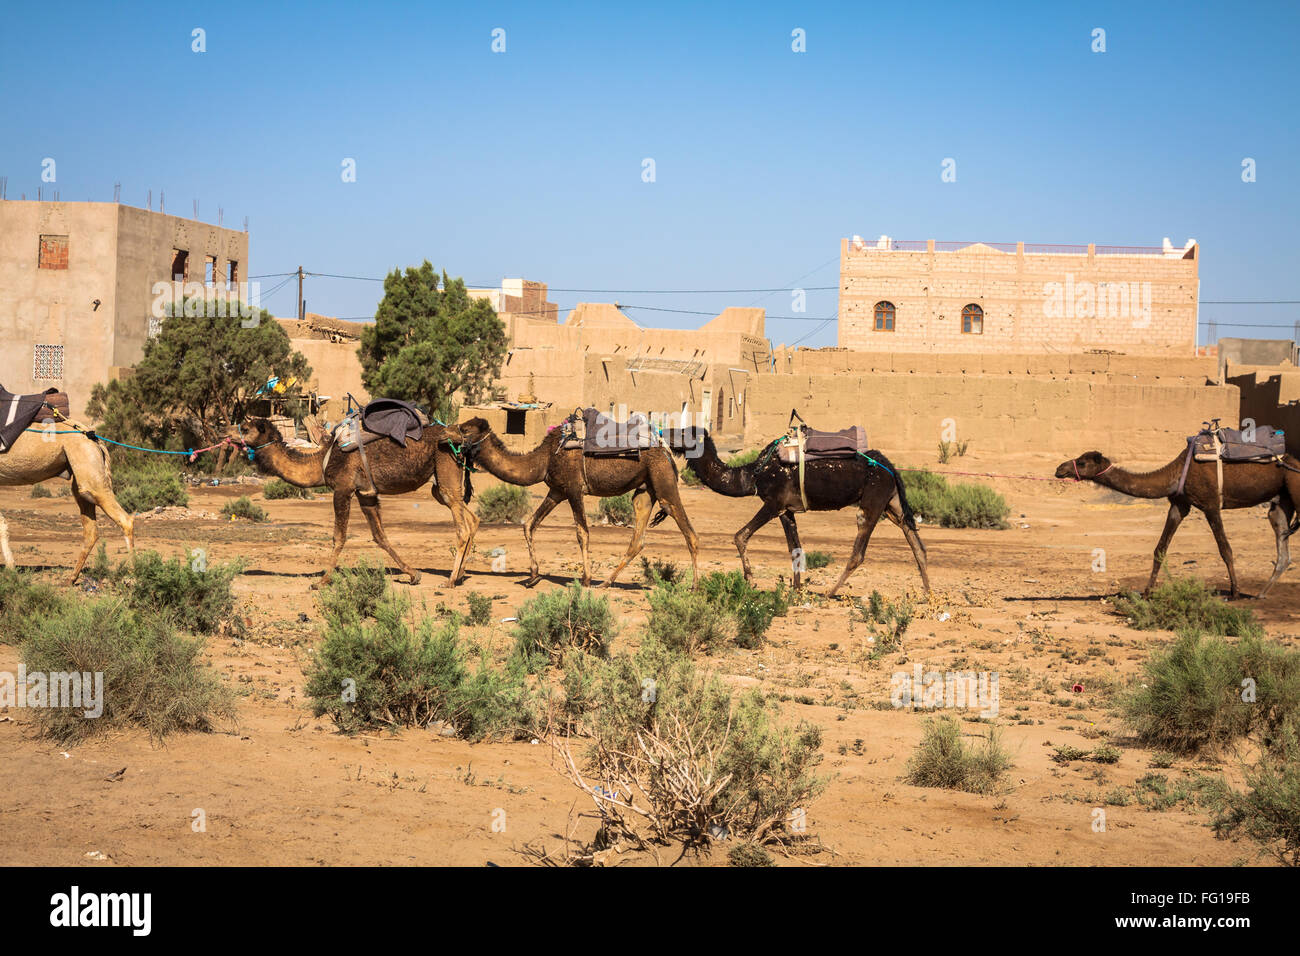 Camel caravan on the Sahara desert ,Merzouga Stock Photo